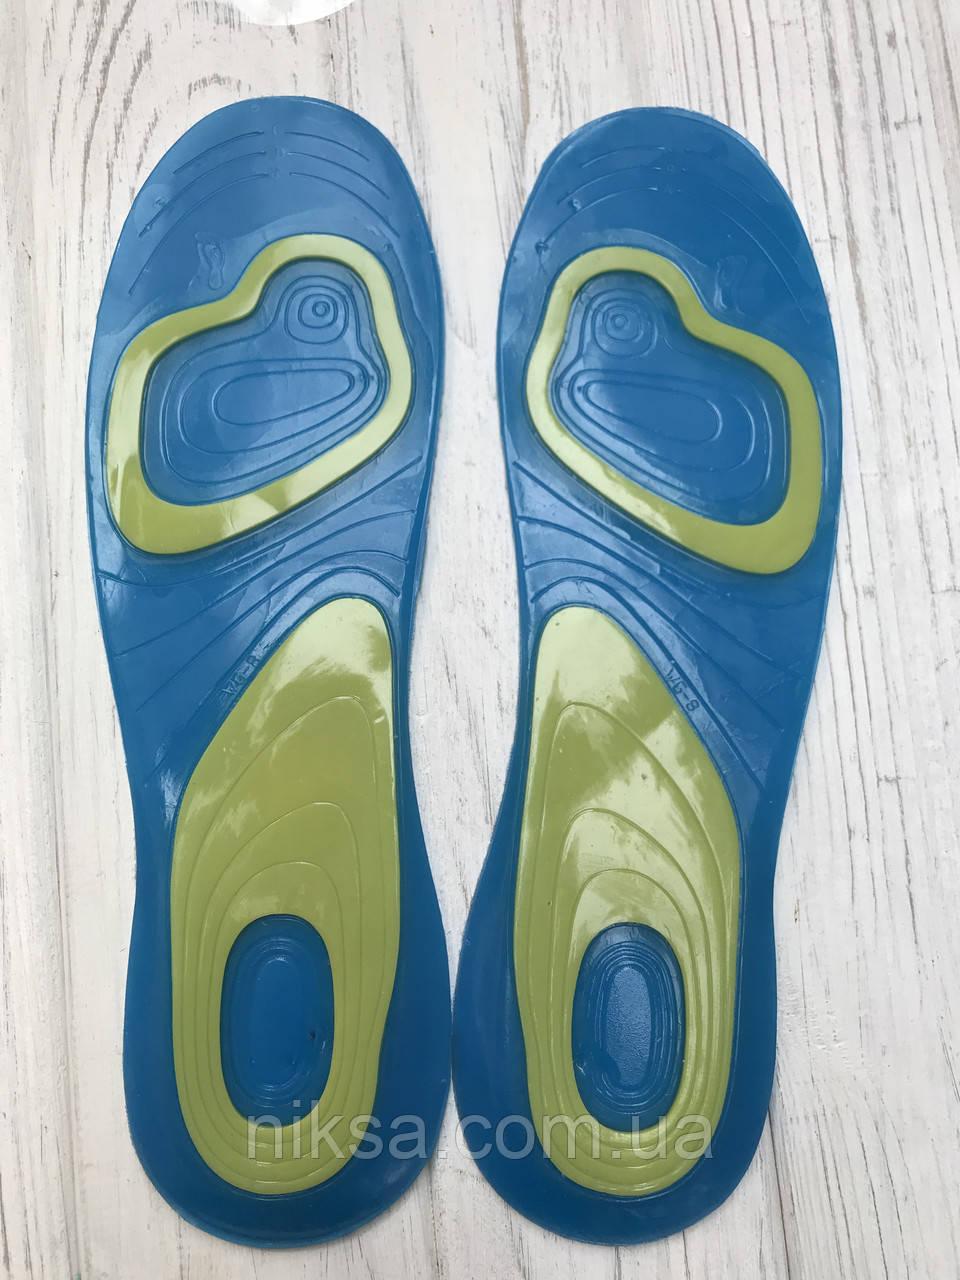 Schol ActiveGel гелевые стельки для обуви